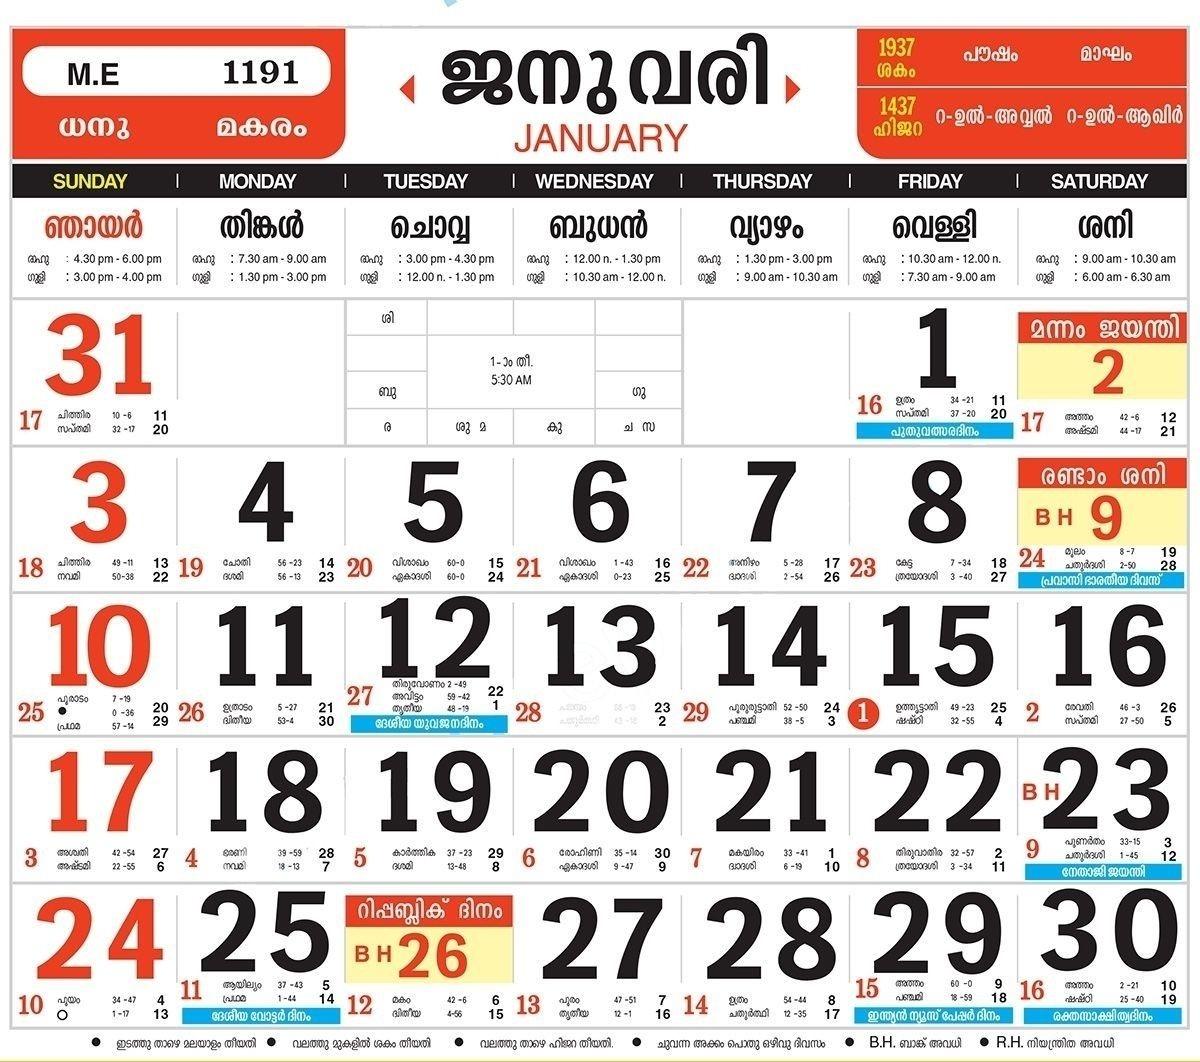 February 2019 Calendar Malayalam | Calendar Format Example  2021 Malayala Manorama Calendar Pdf